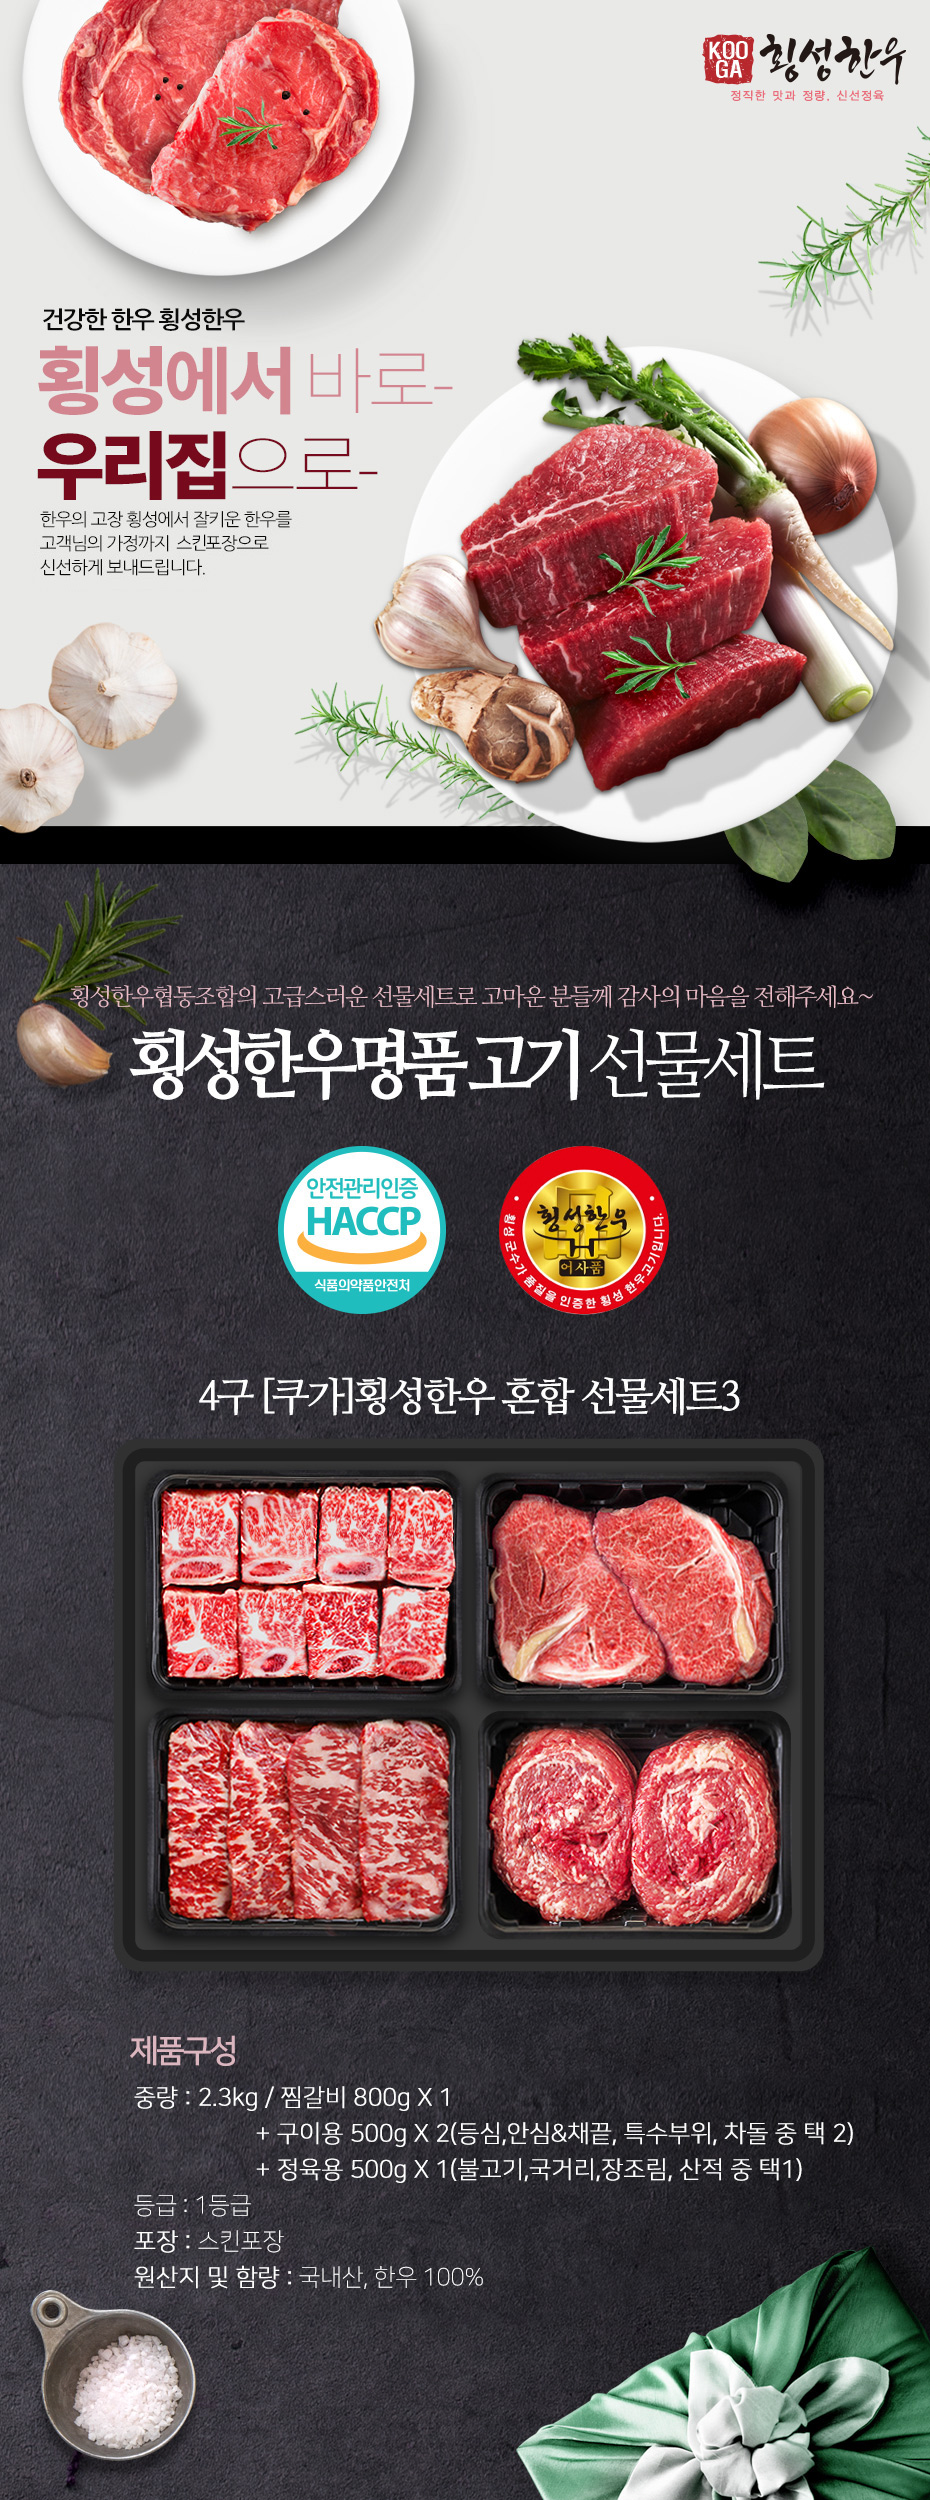 set4_meat_rib1_ten2_s1_004014.jpg